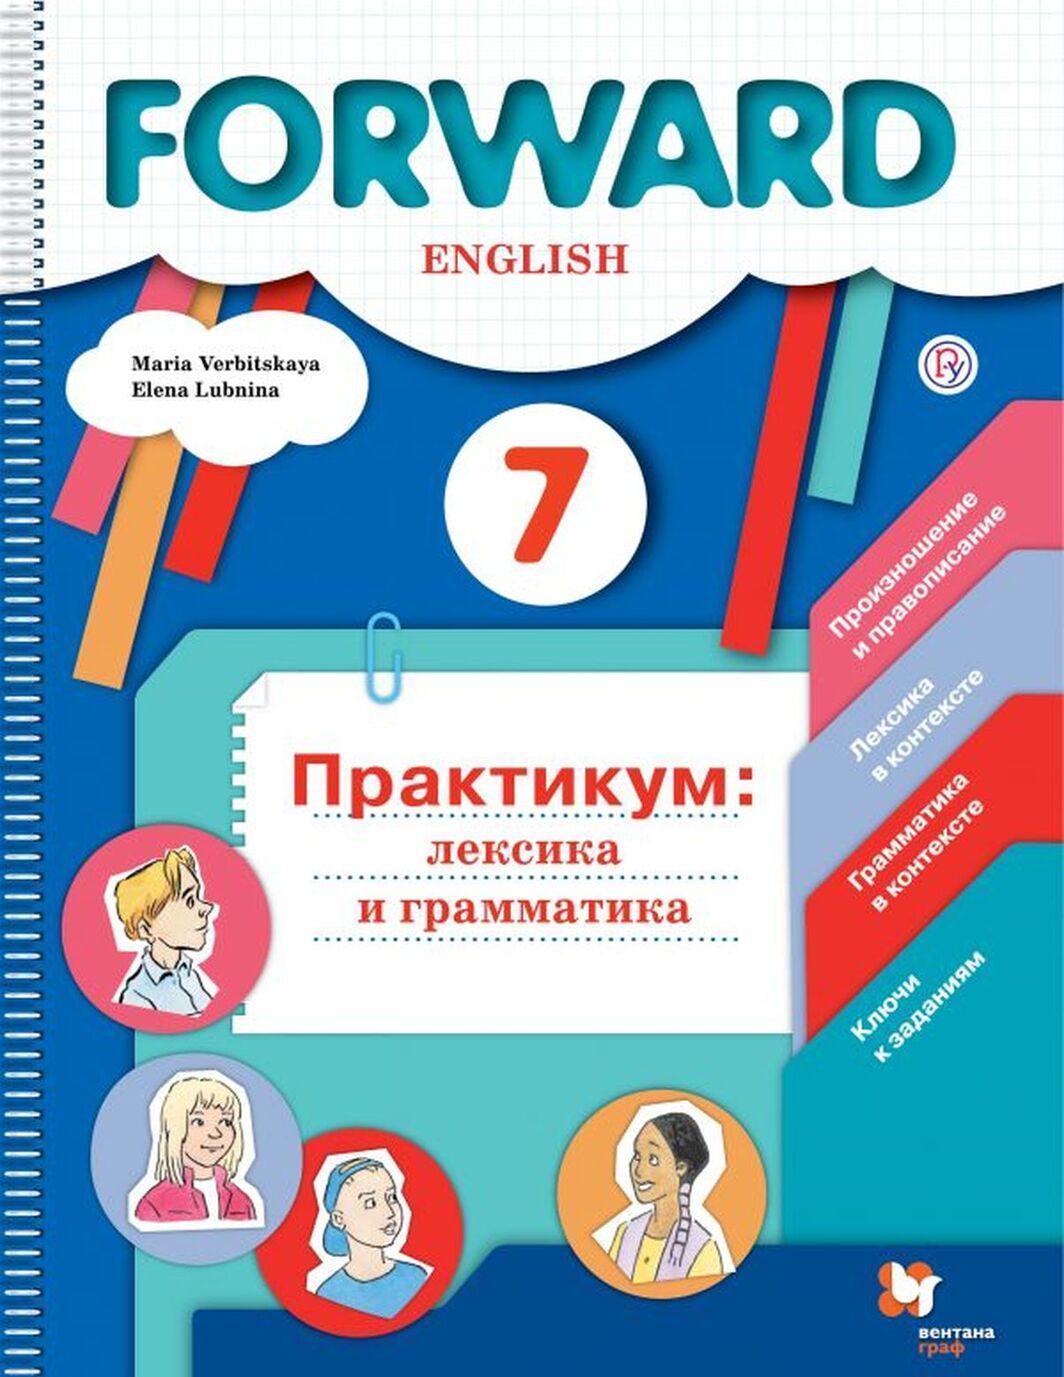 Английский язык. 7 класс. Практикум. Лексика и грамматика